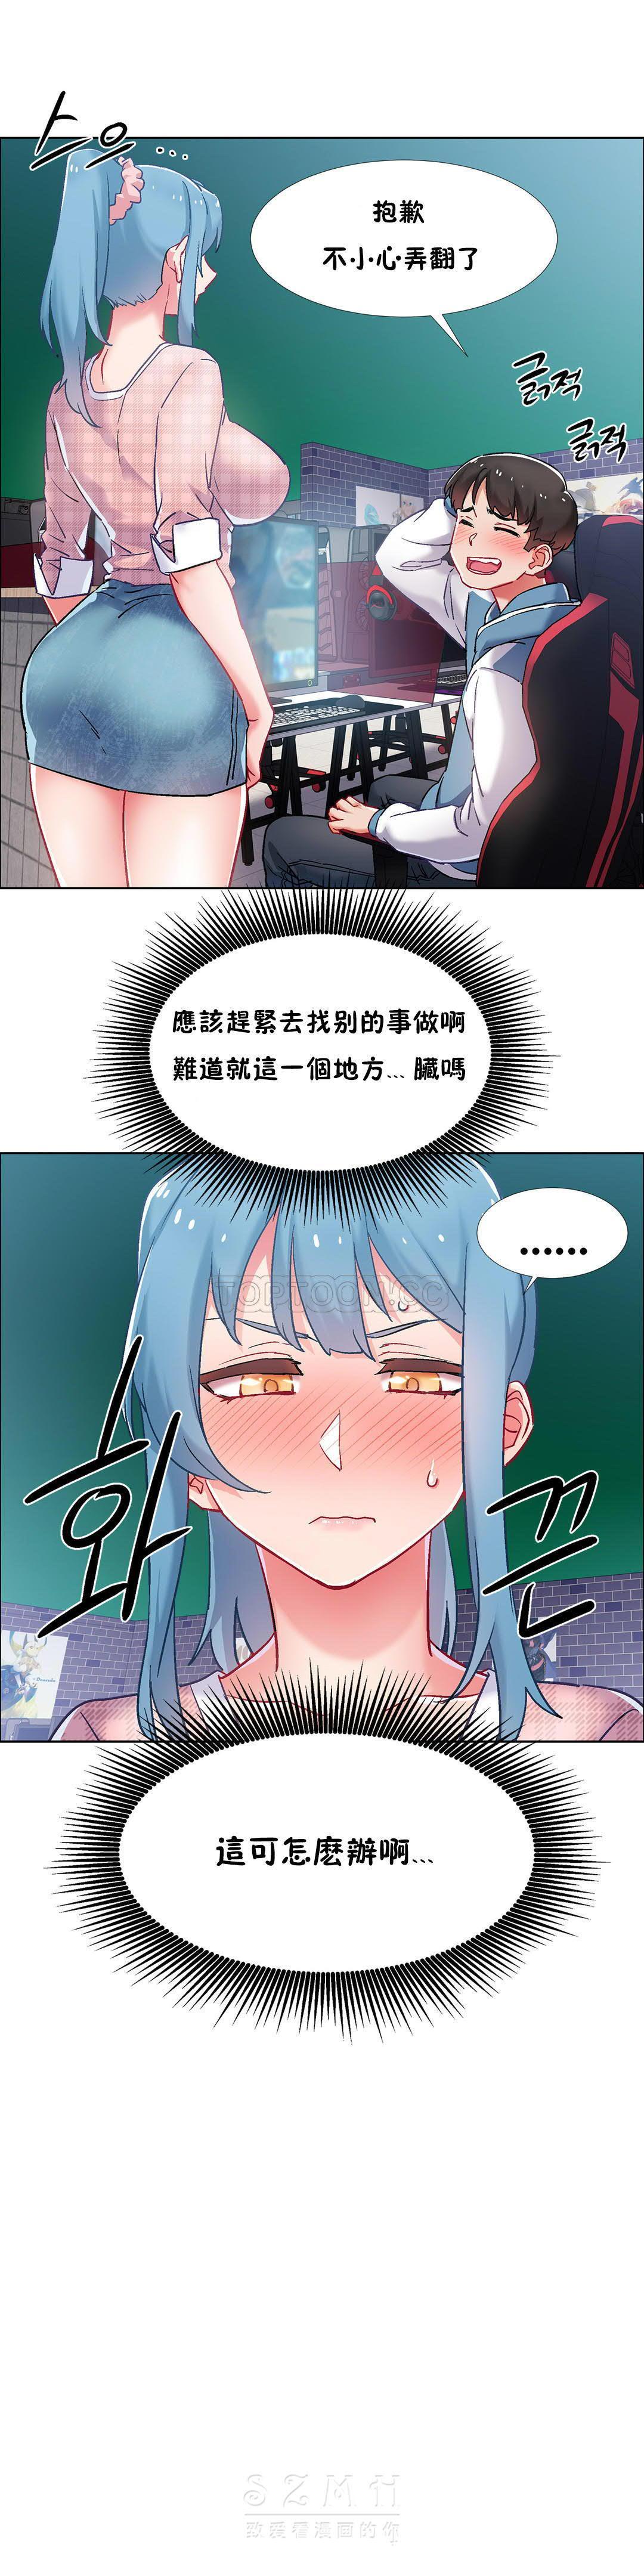 [Studio Wannabe] Rental Girls | 出租女郎 Ch. 33-58 [Chinese]  第二季 完结 51